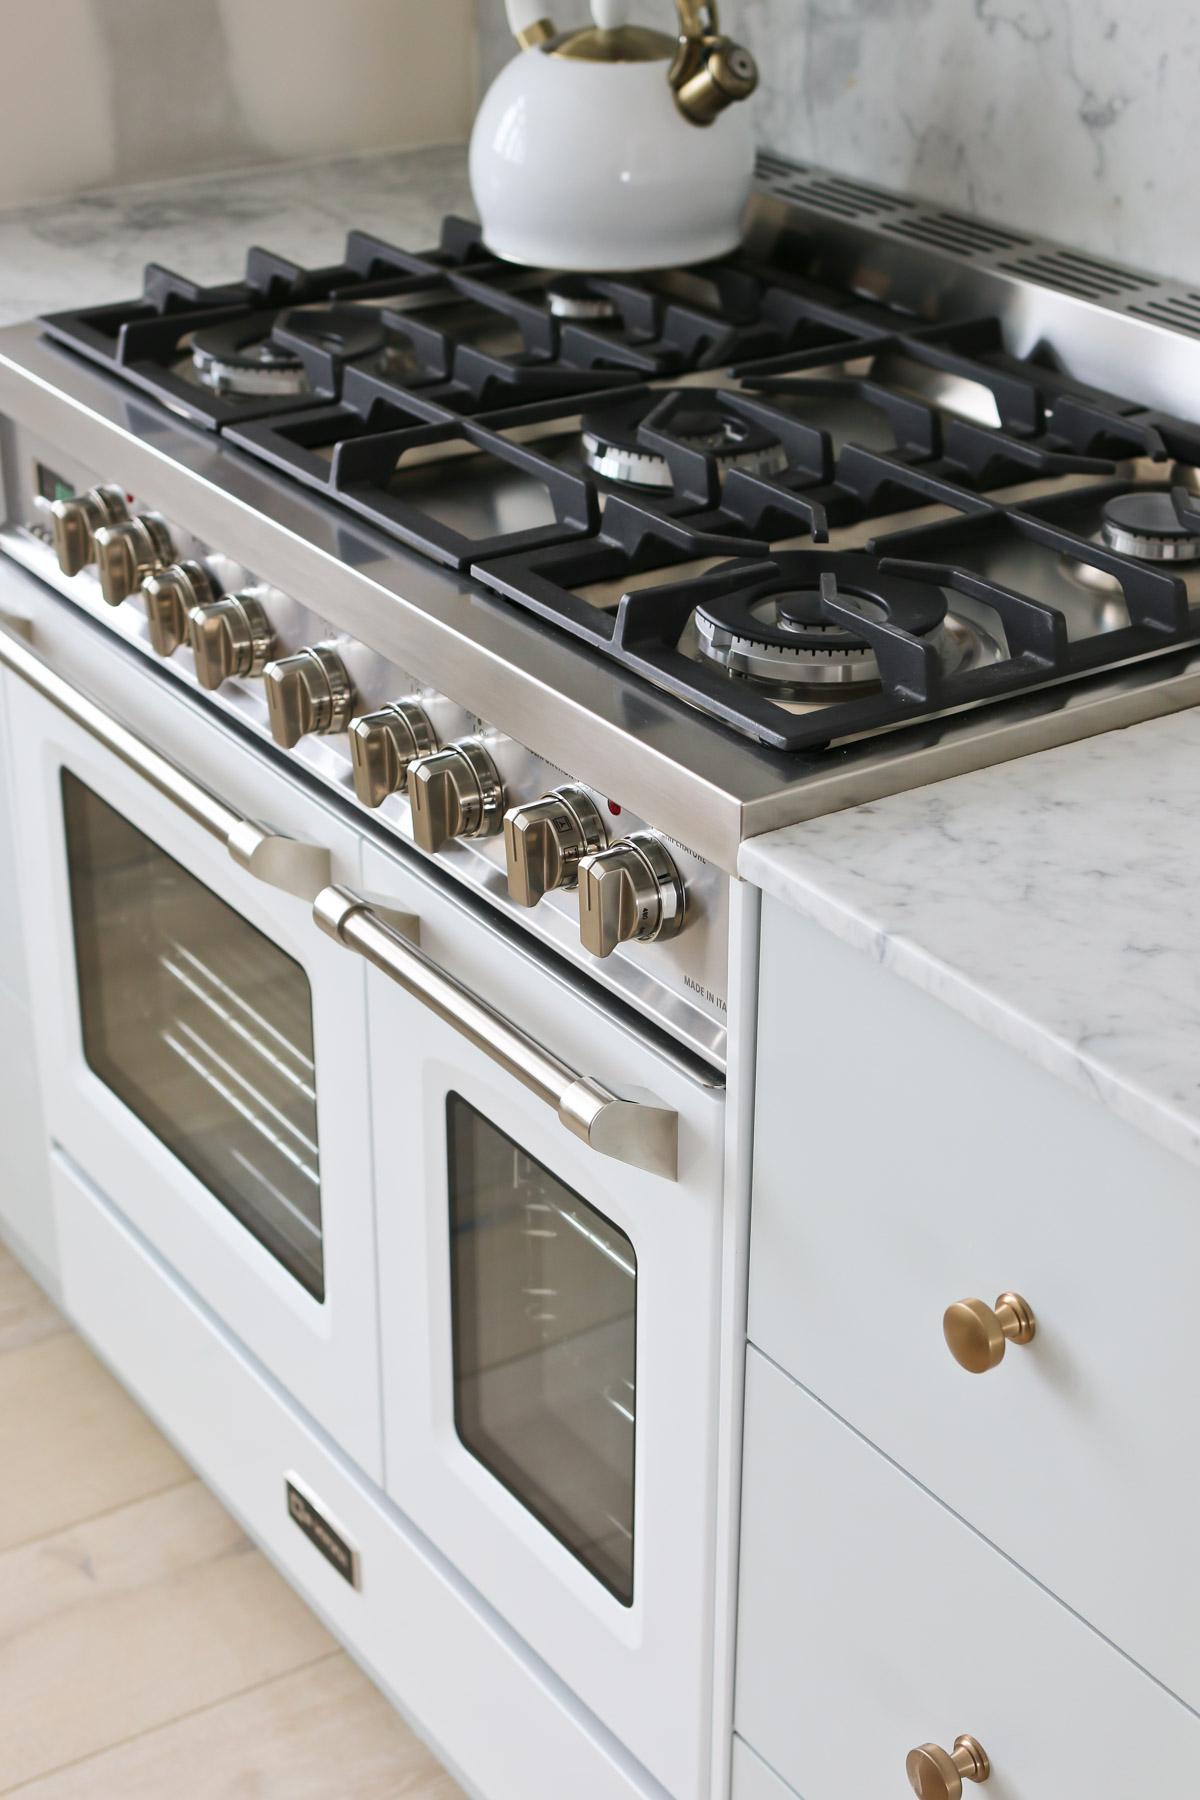 DIY Marble Countertops and Backsplash